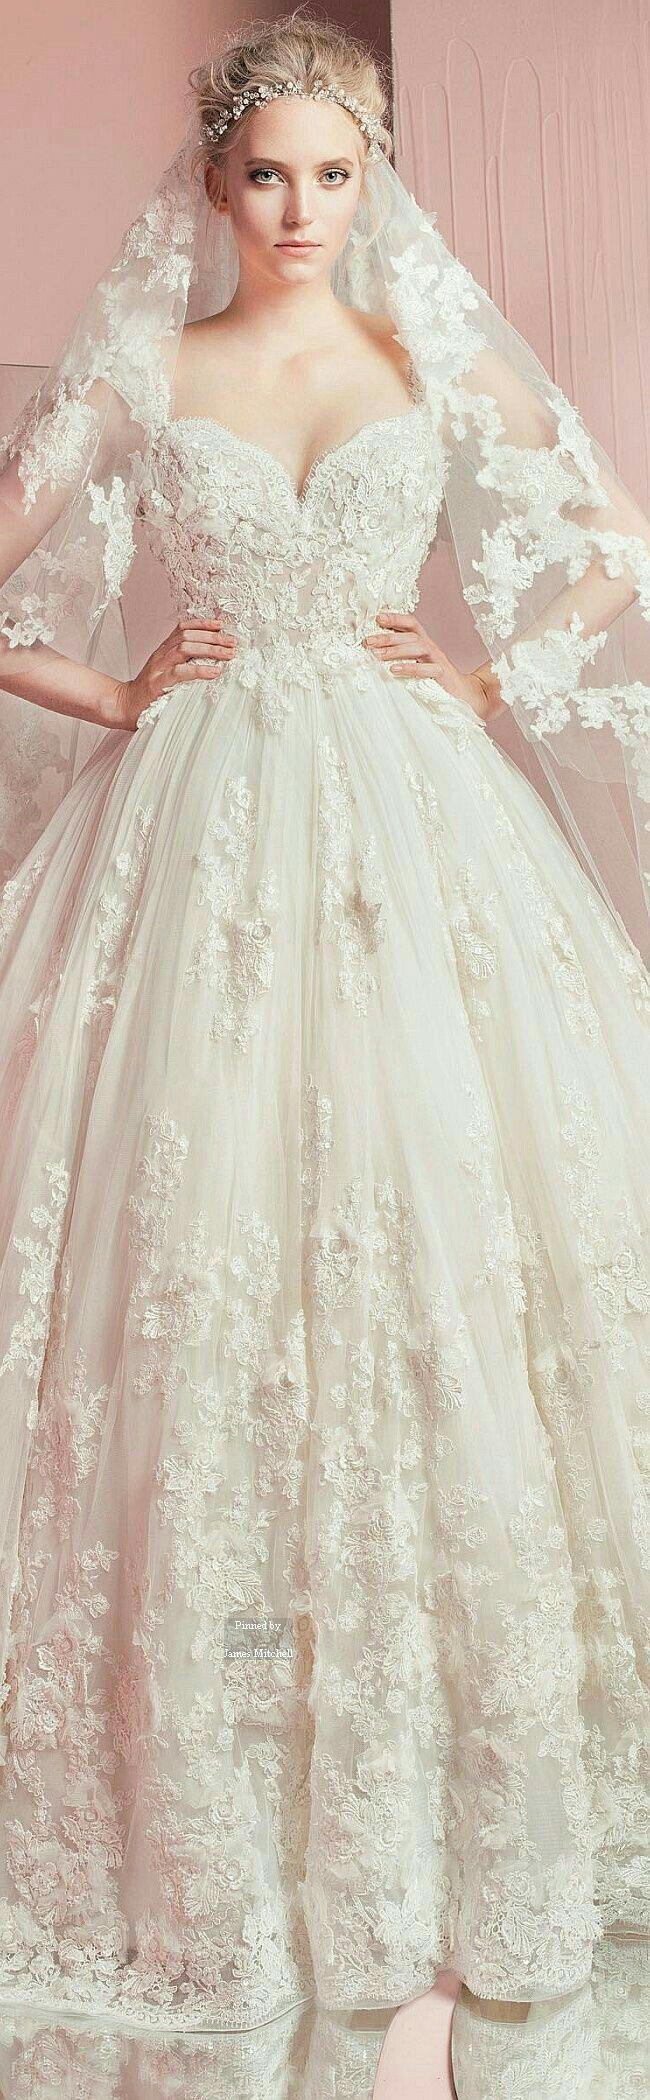 41 best VESTIDOS DE NOVIA images on Pinterest | Kleid hochzeit ...